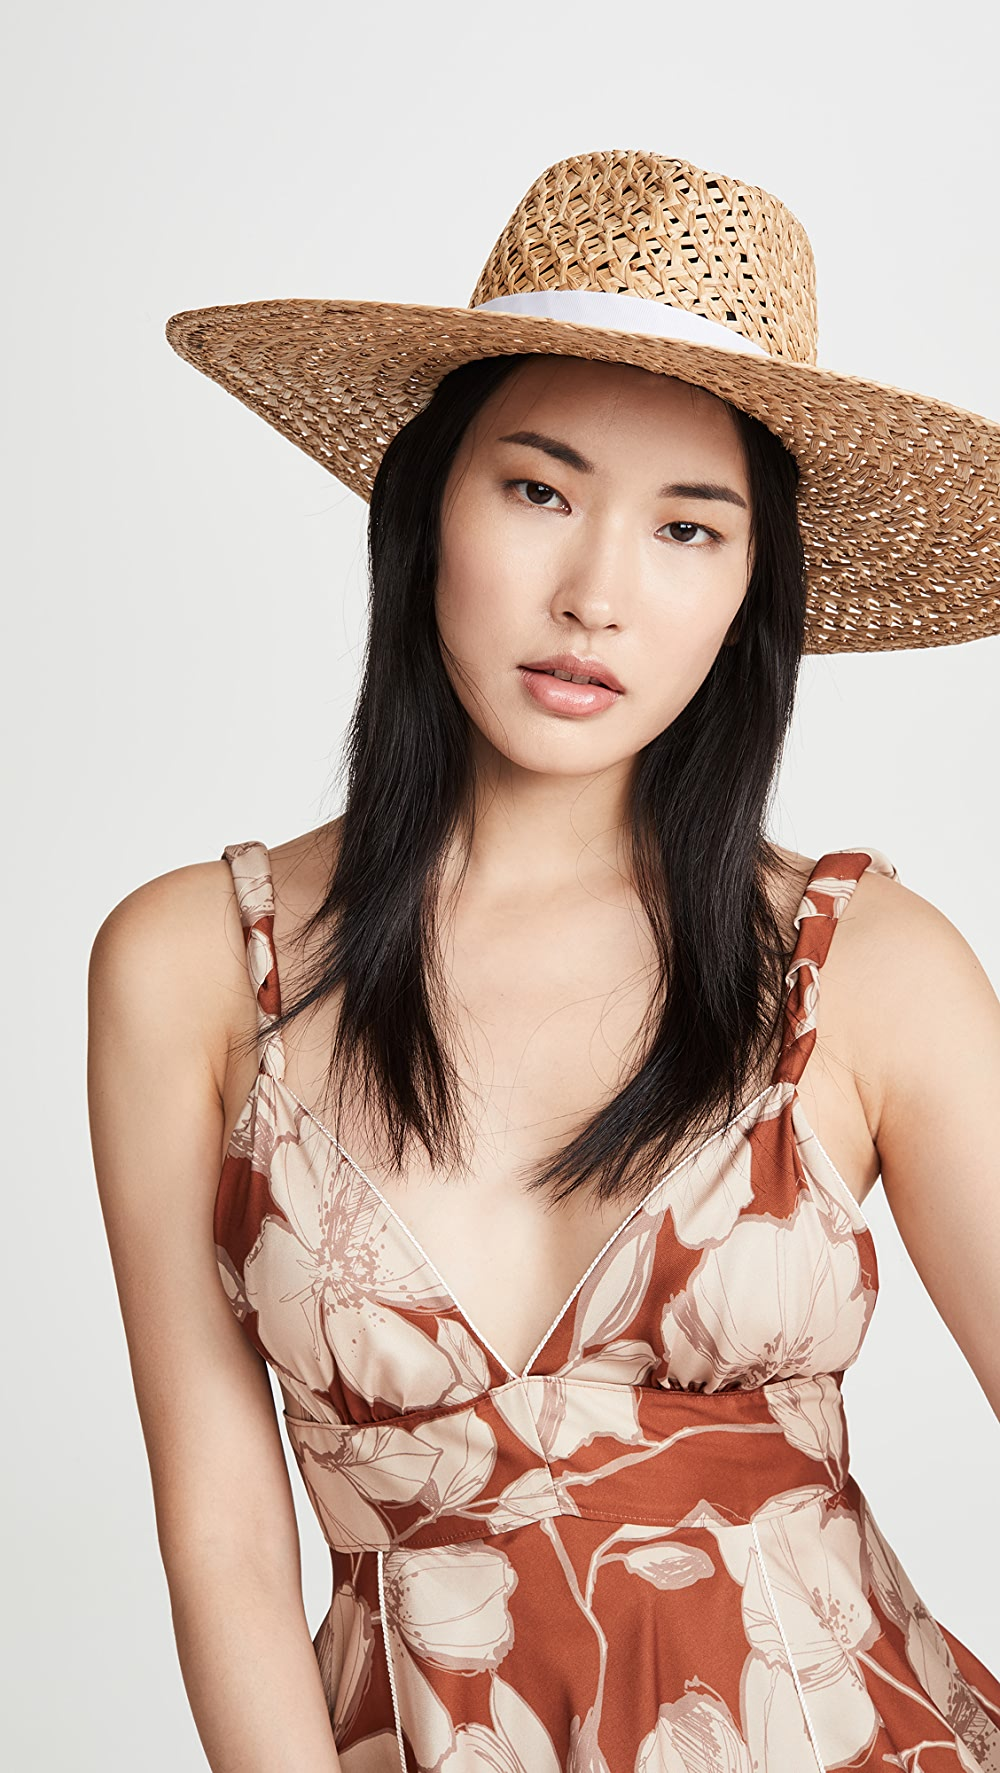 Candid Rag & Bone - Open Weave Wide Brimmed Hat Large Assortment